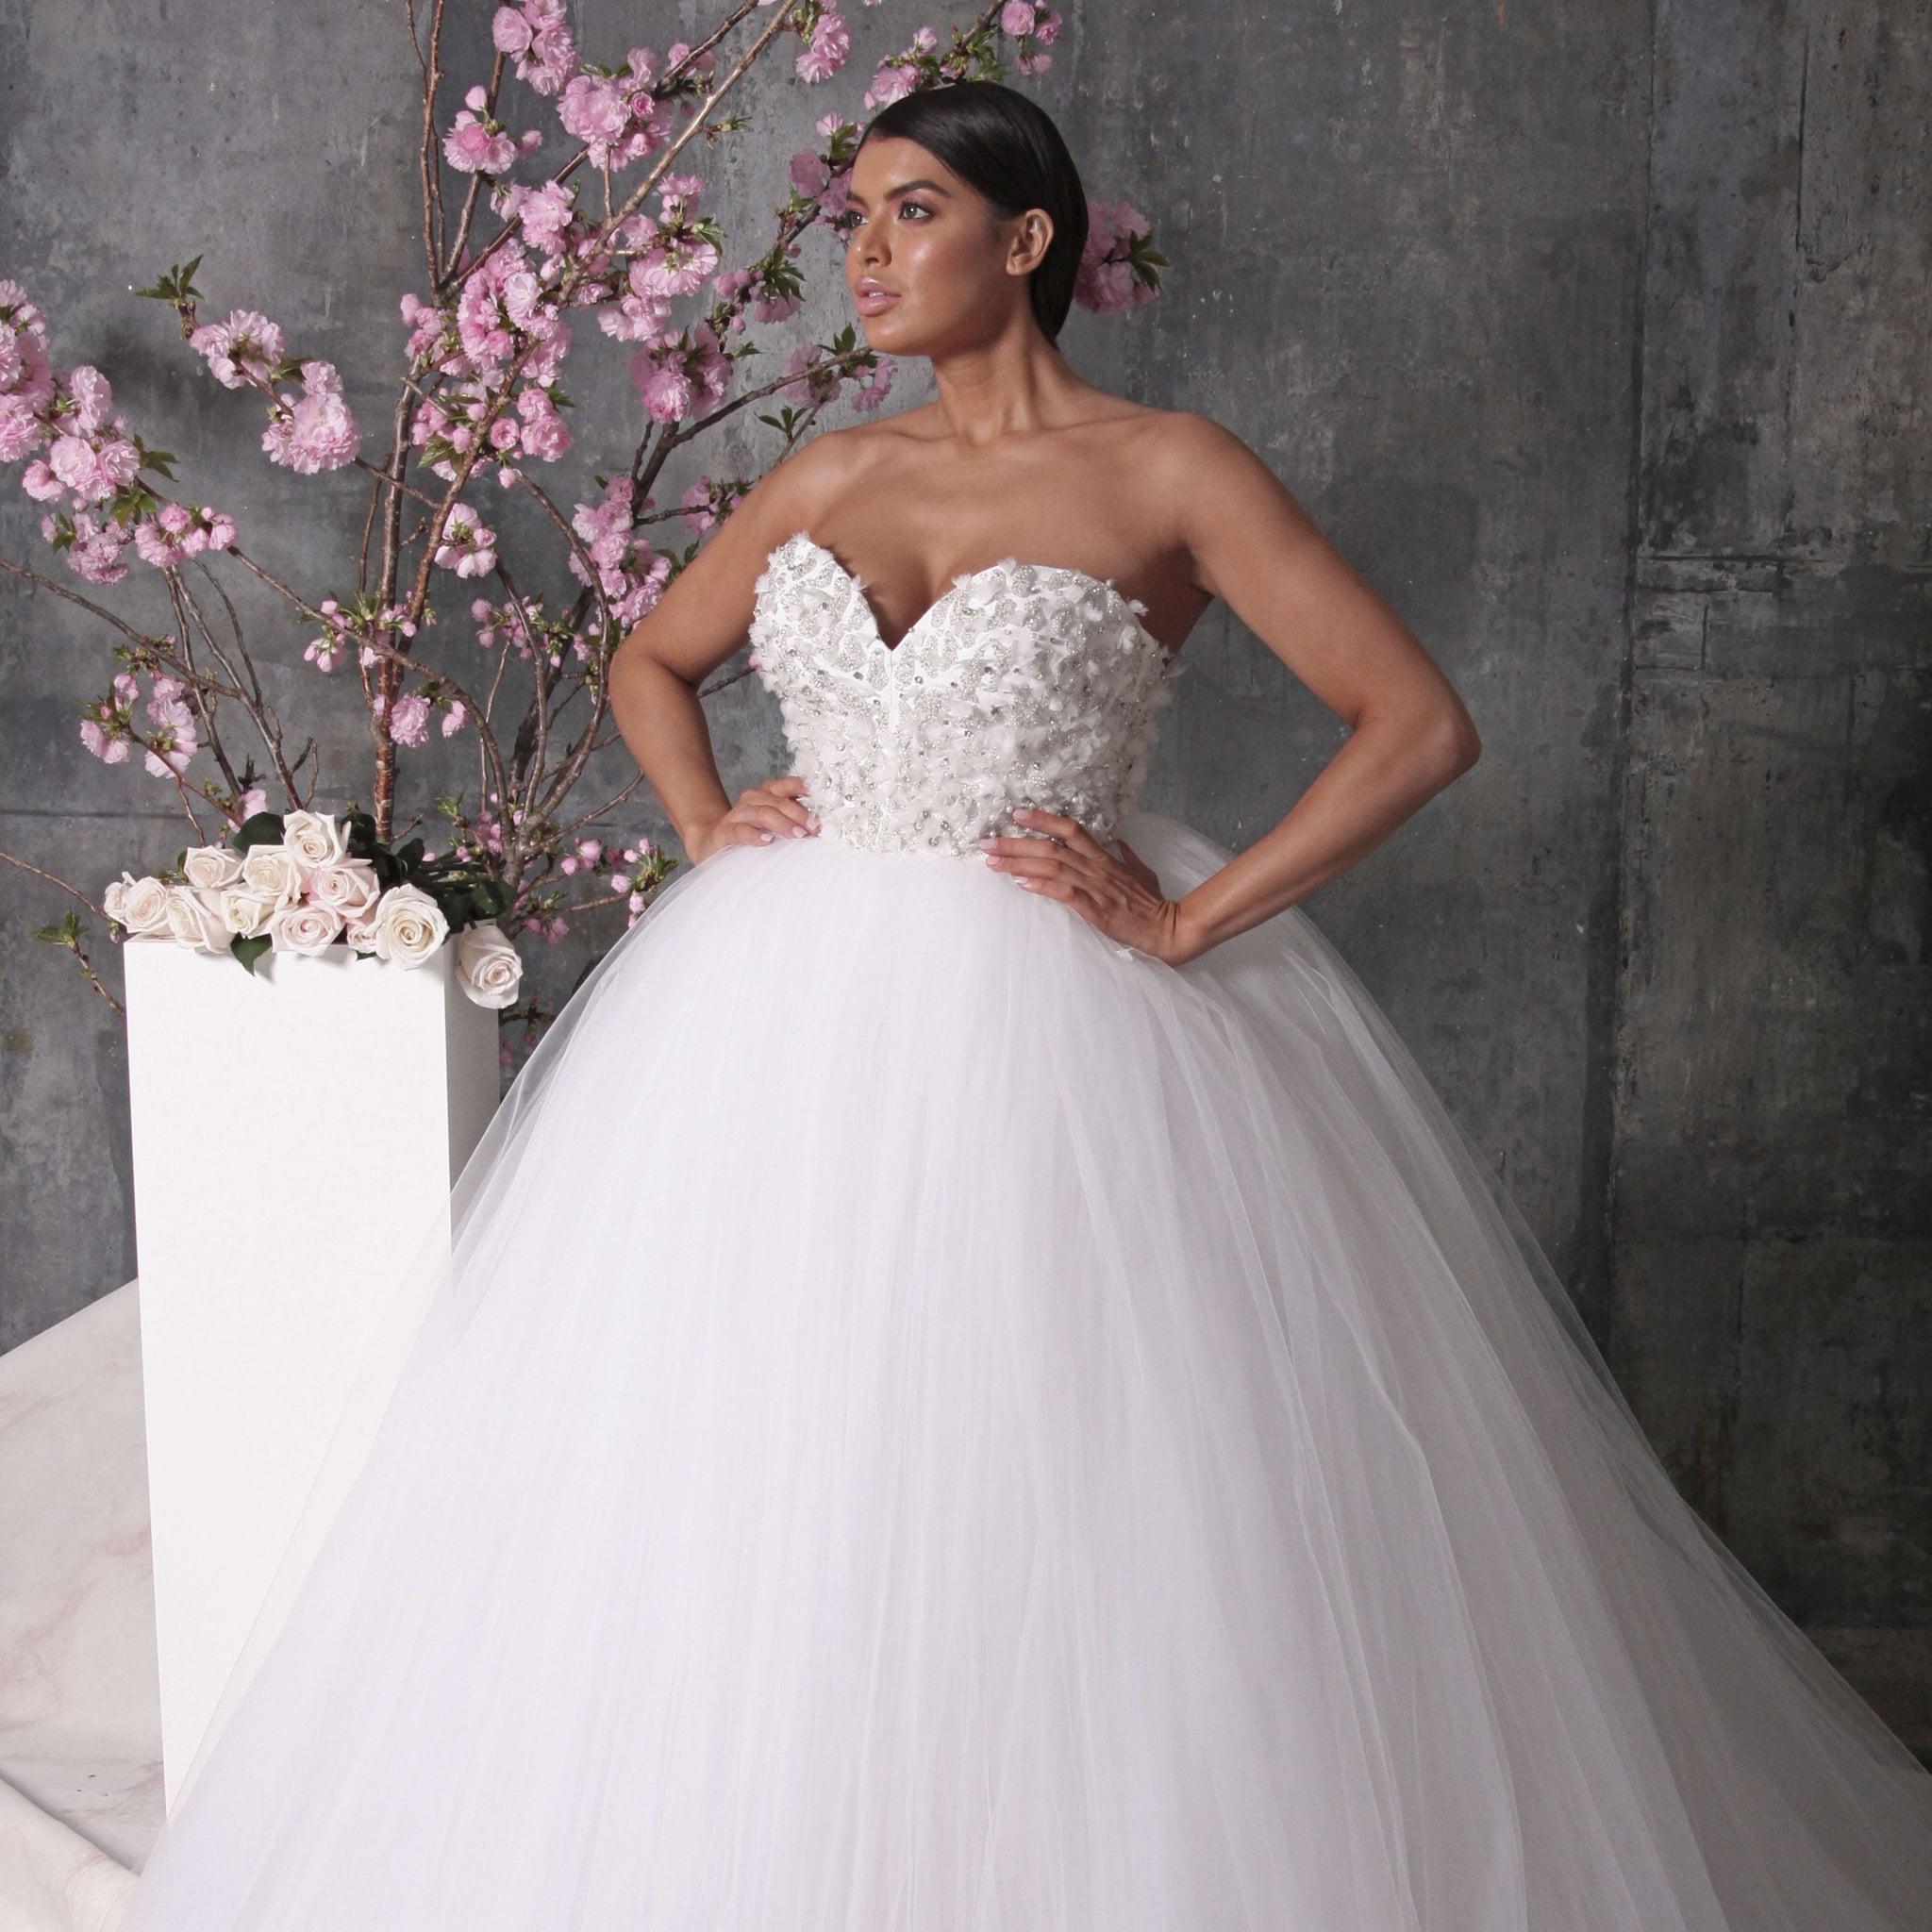 Vow Renewal Wedding Dresses 87 Fresh